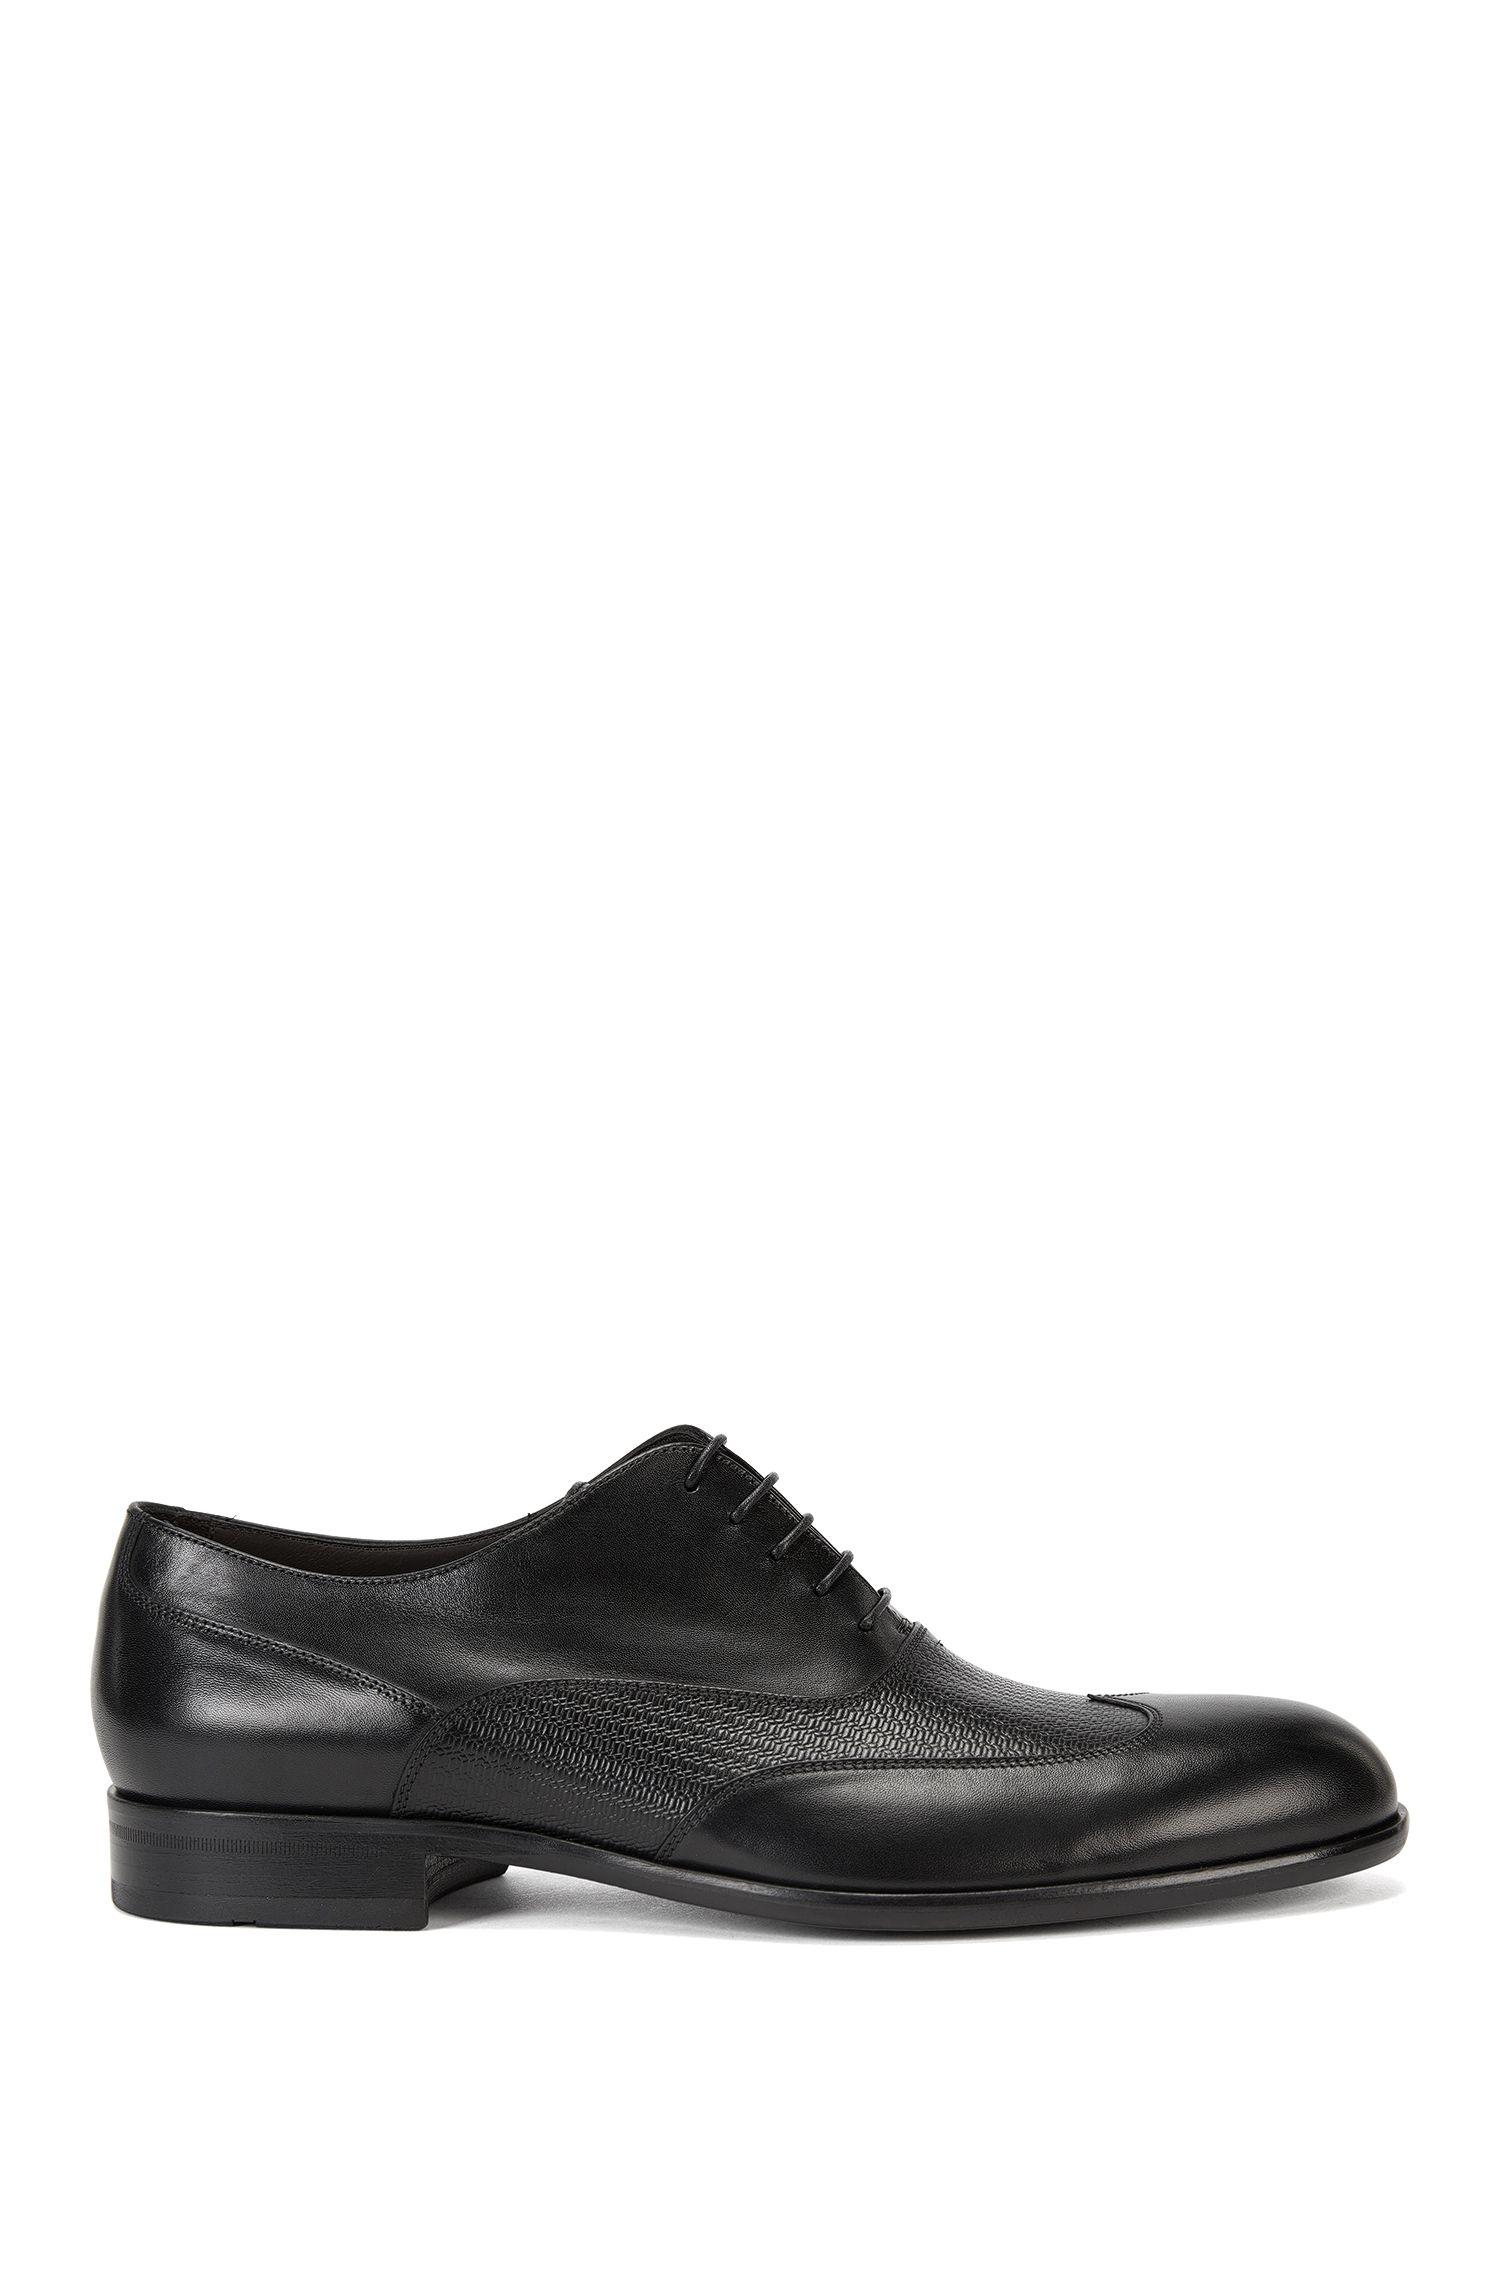 Oxford-Schuhe mit Details aus Print-Leder